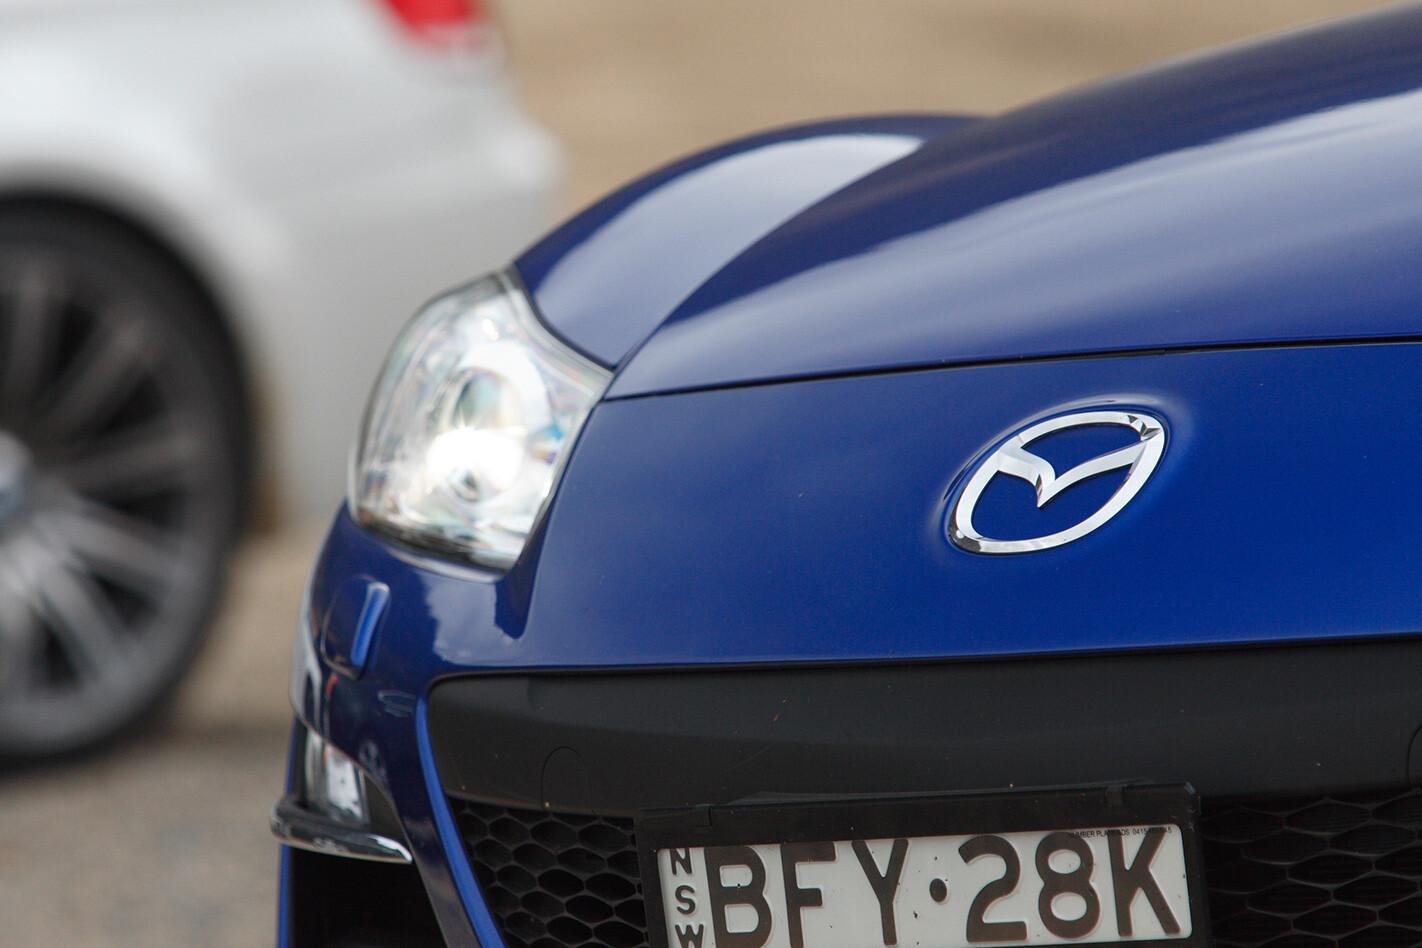 2008-Mazda-RX-8-GT-headlight.jpg